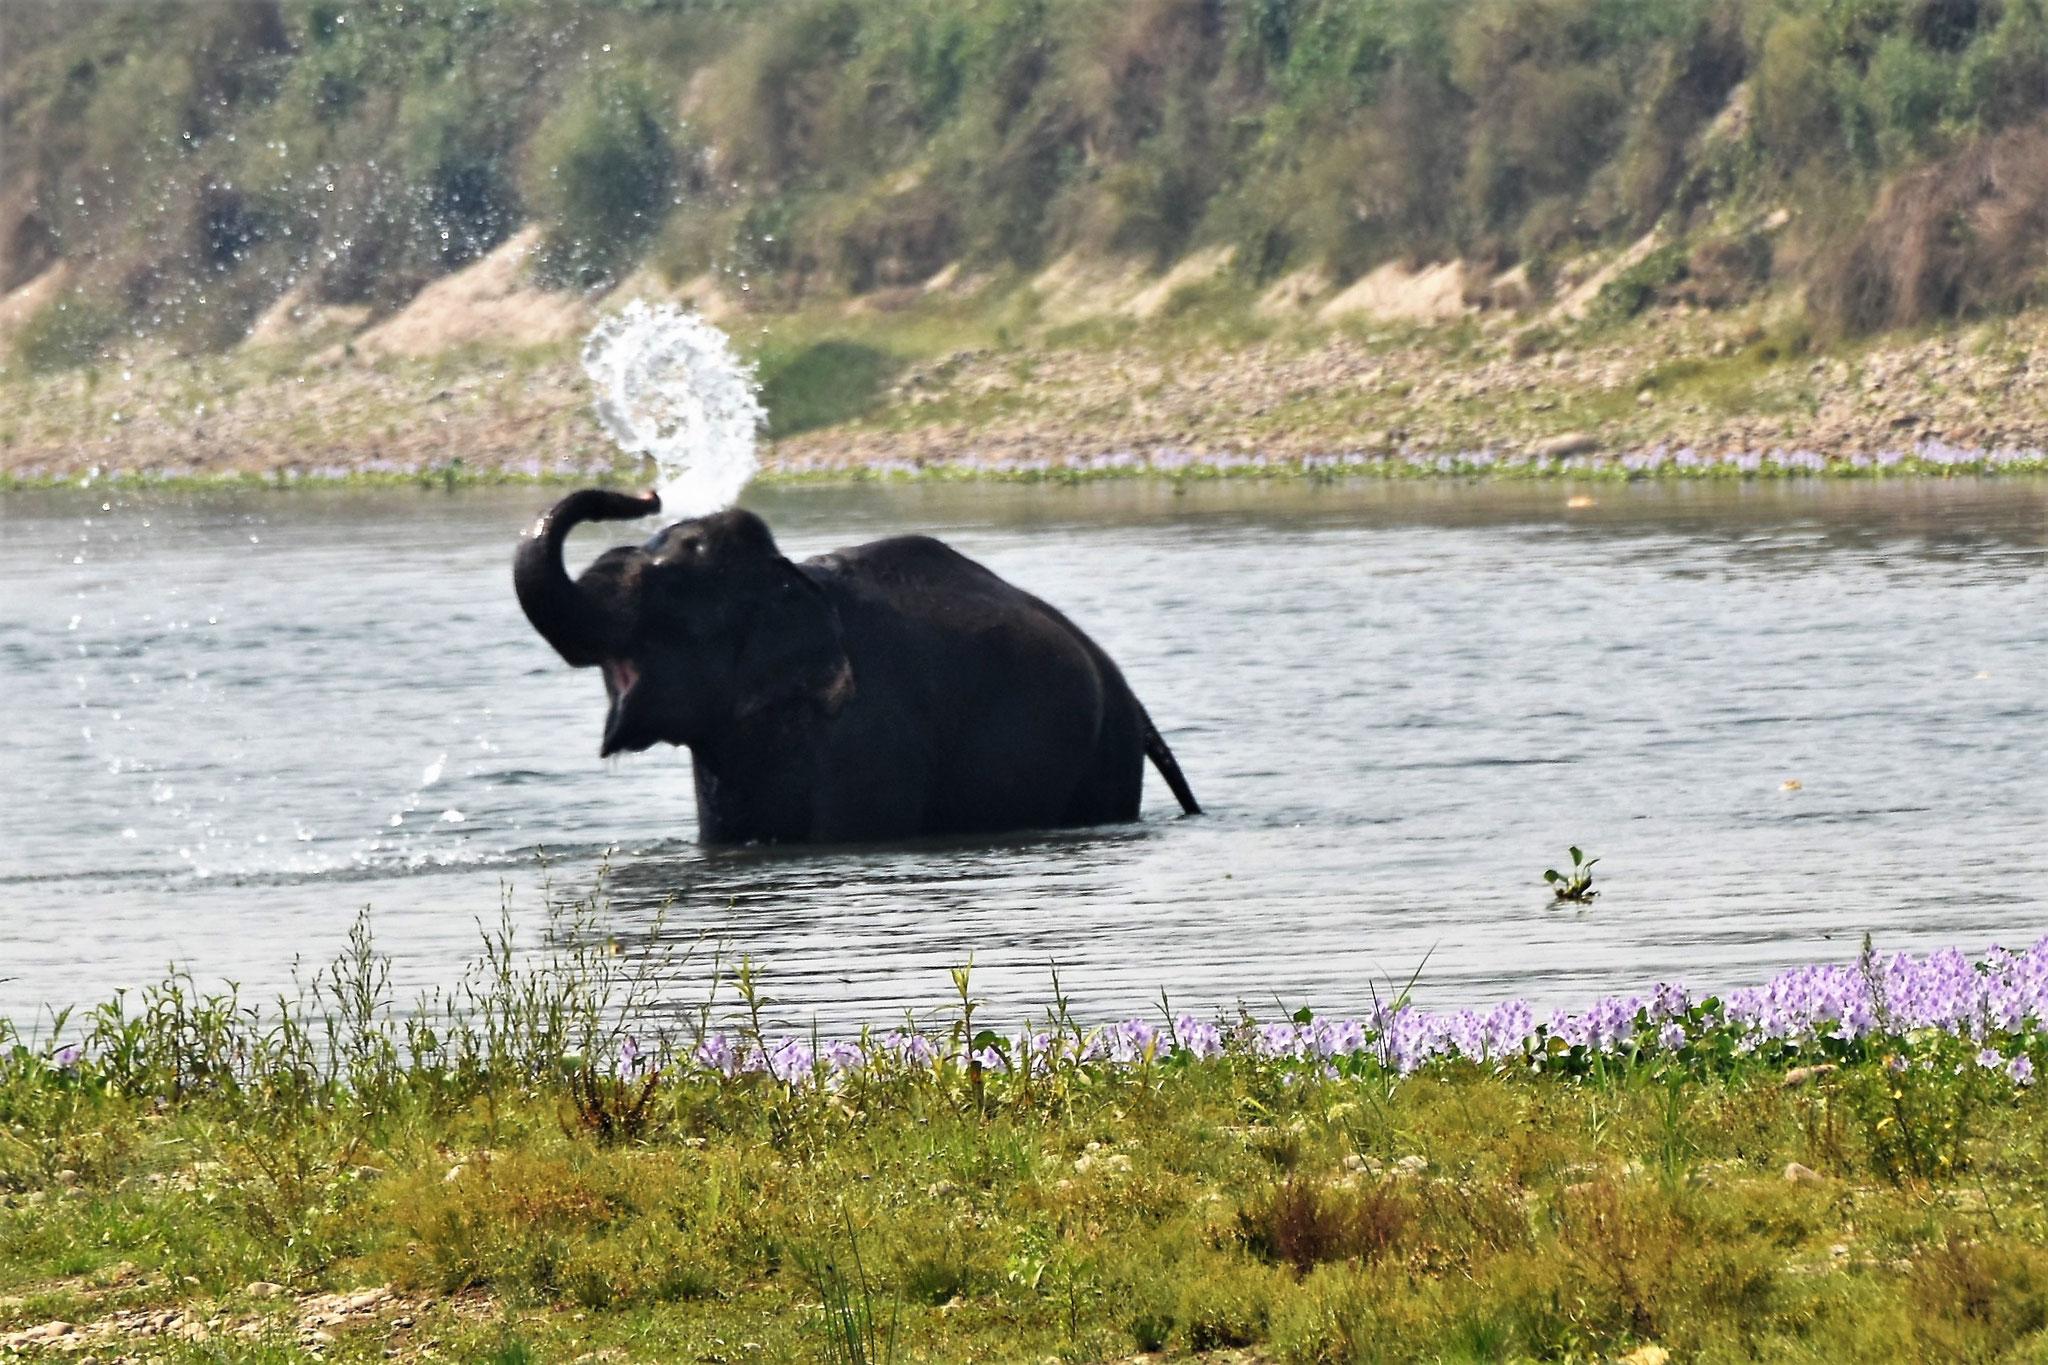 Elefantenbaden im Fluss